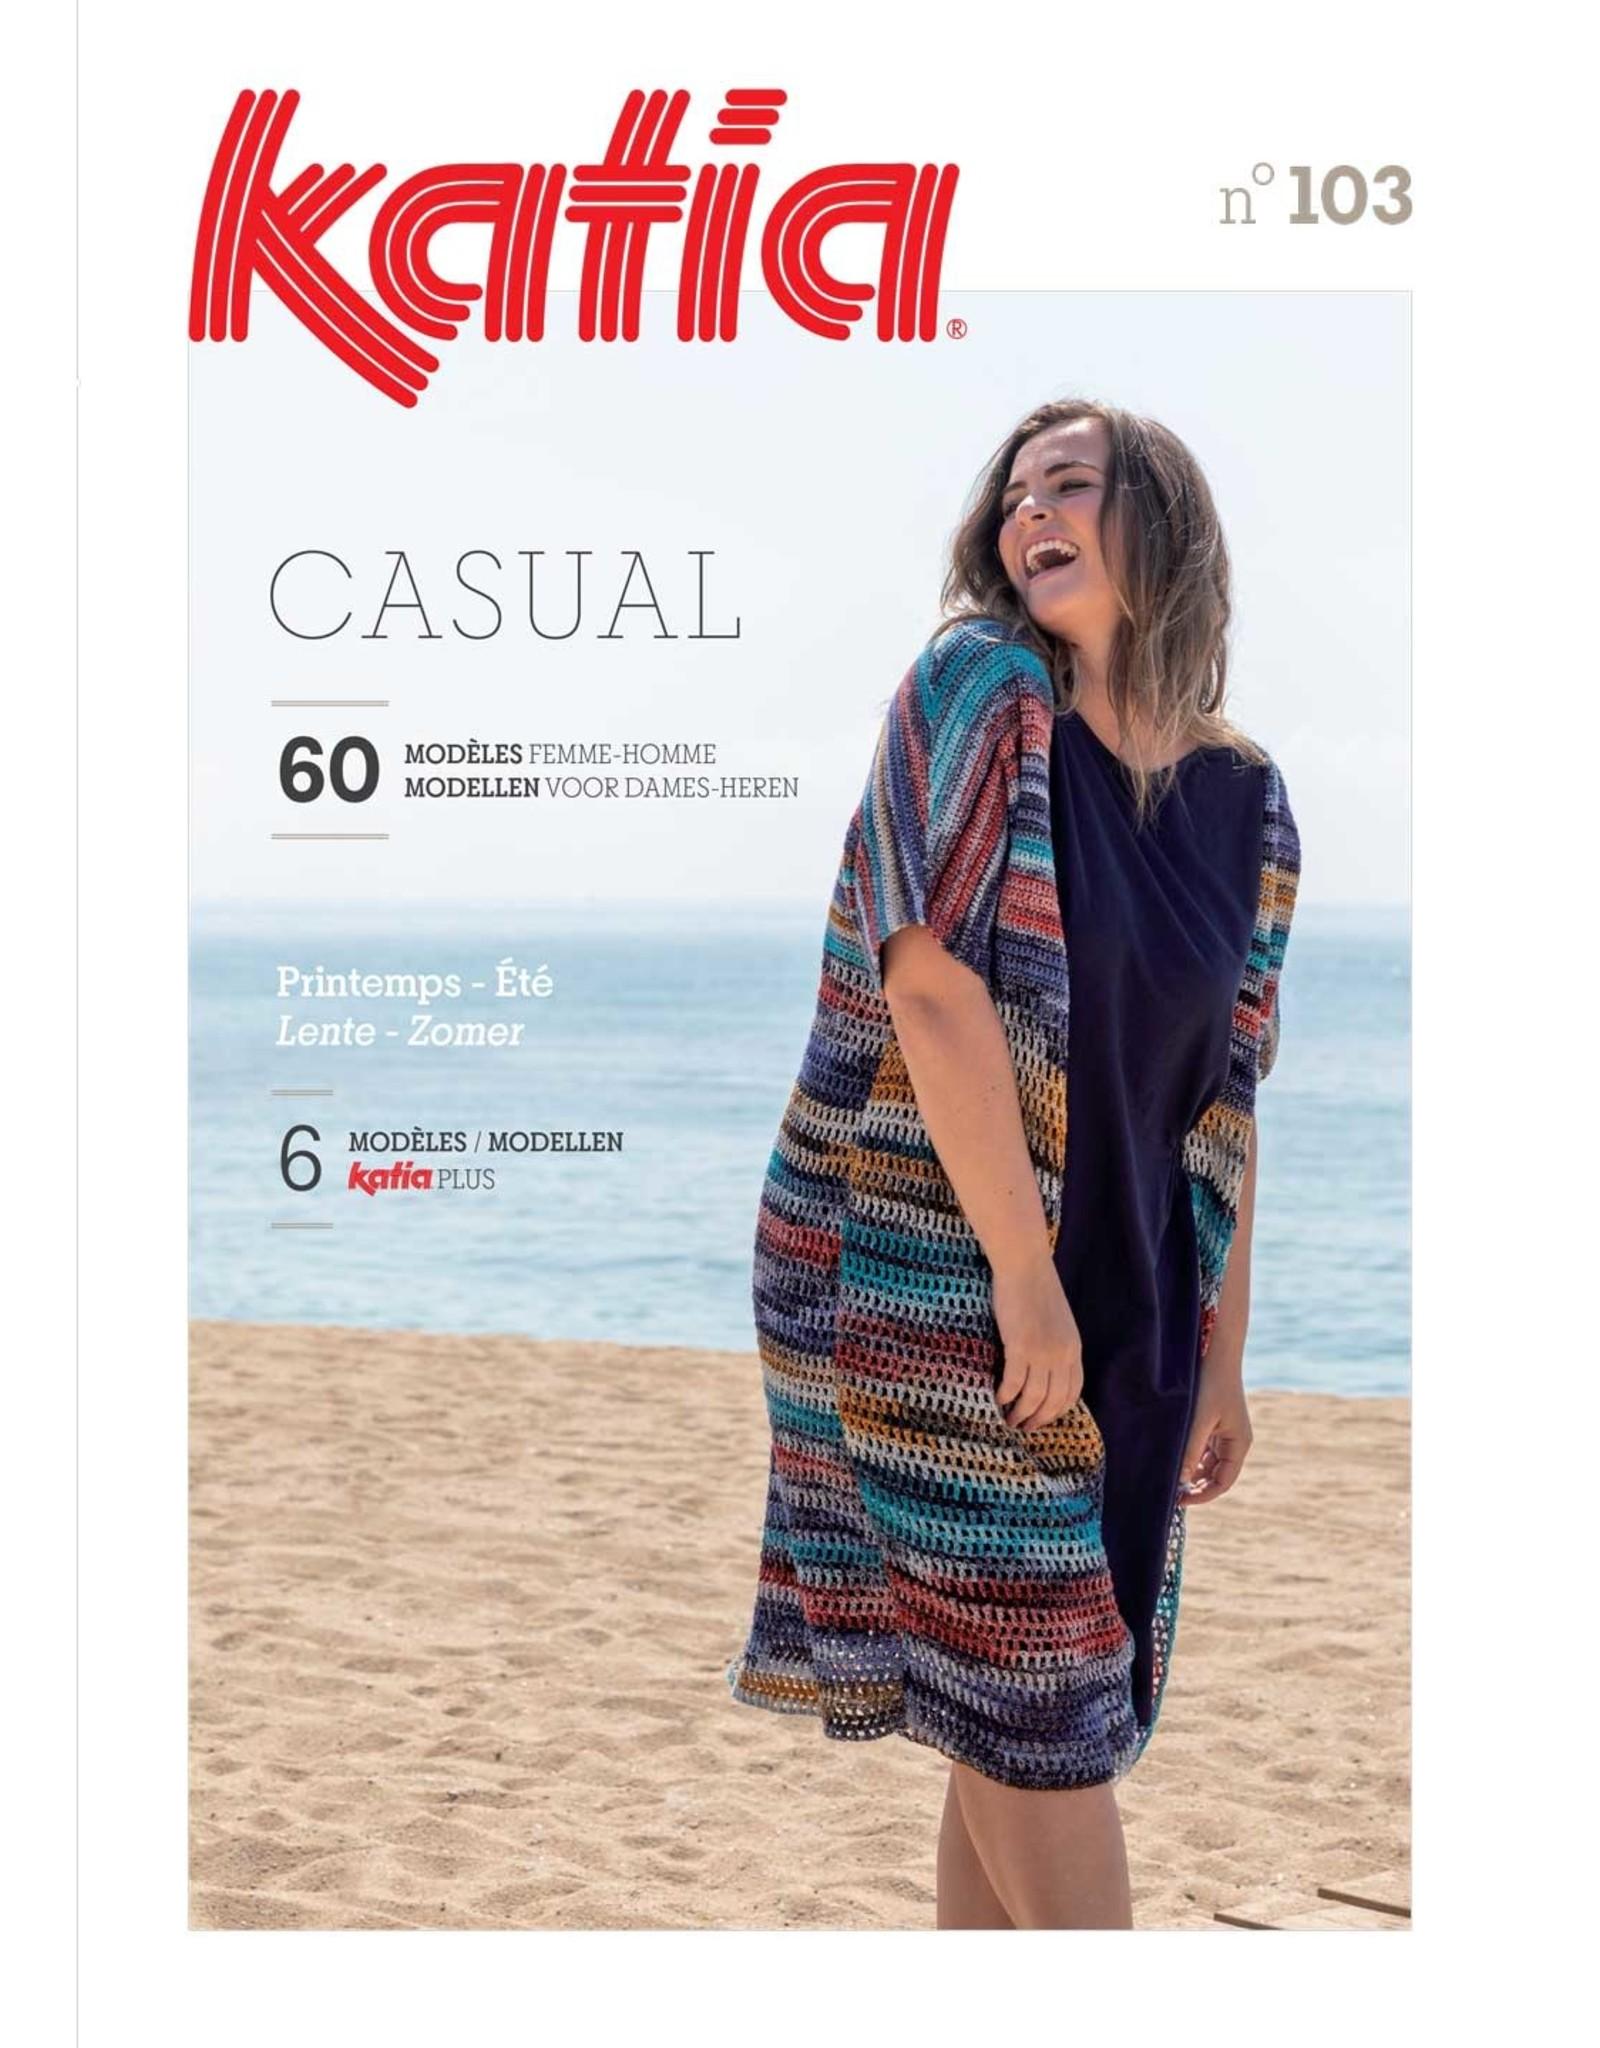 Katia Boek - casual 103 lente - zomer